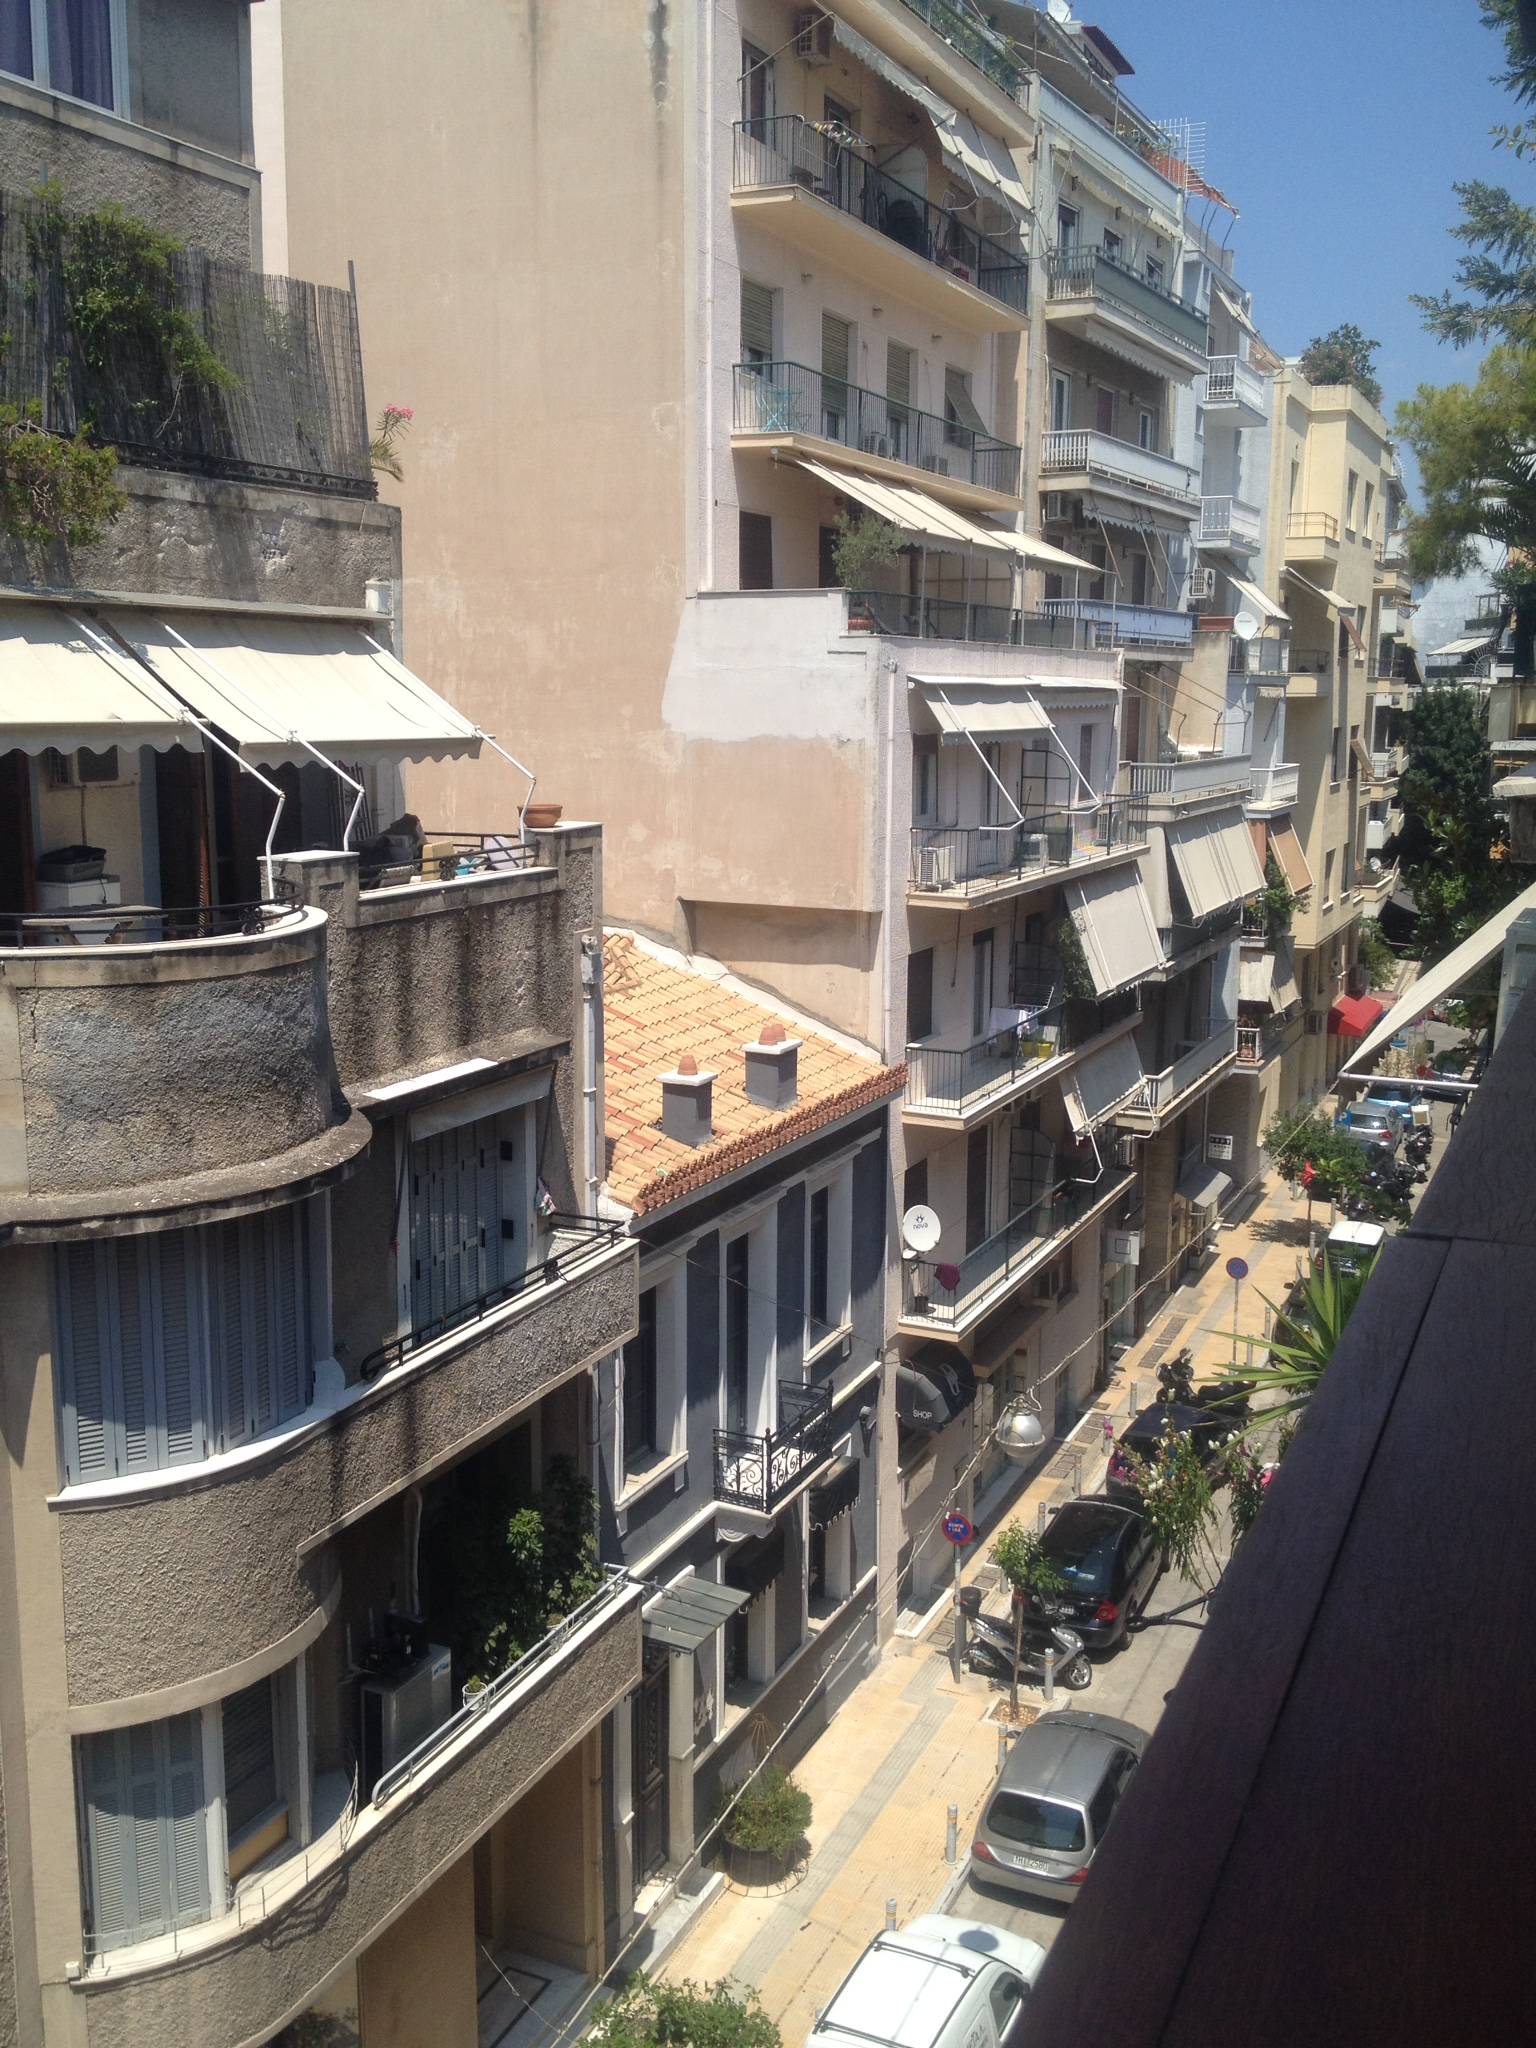 AthensGreeceJuly2015-4